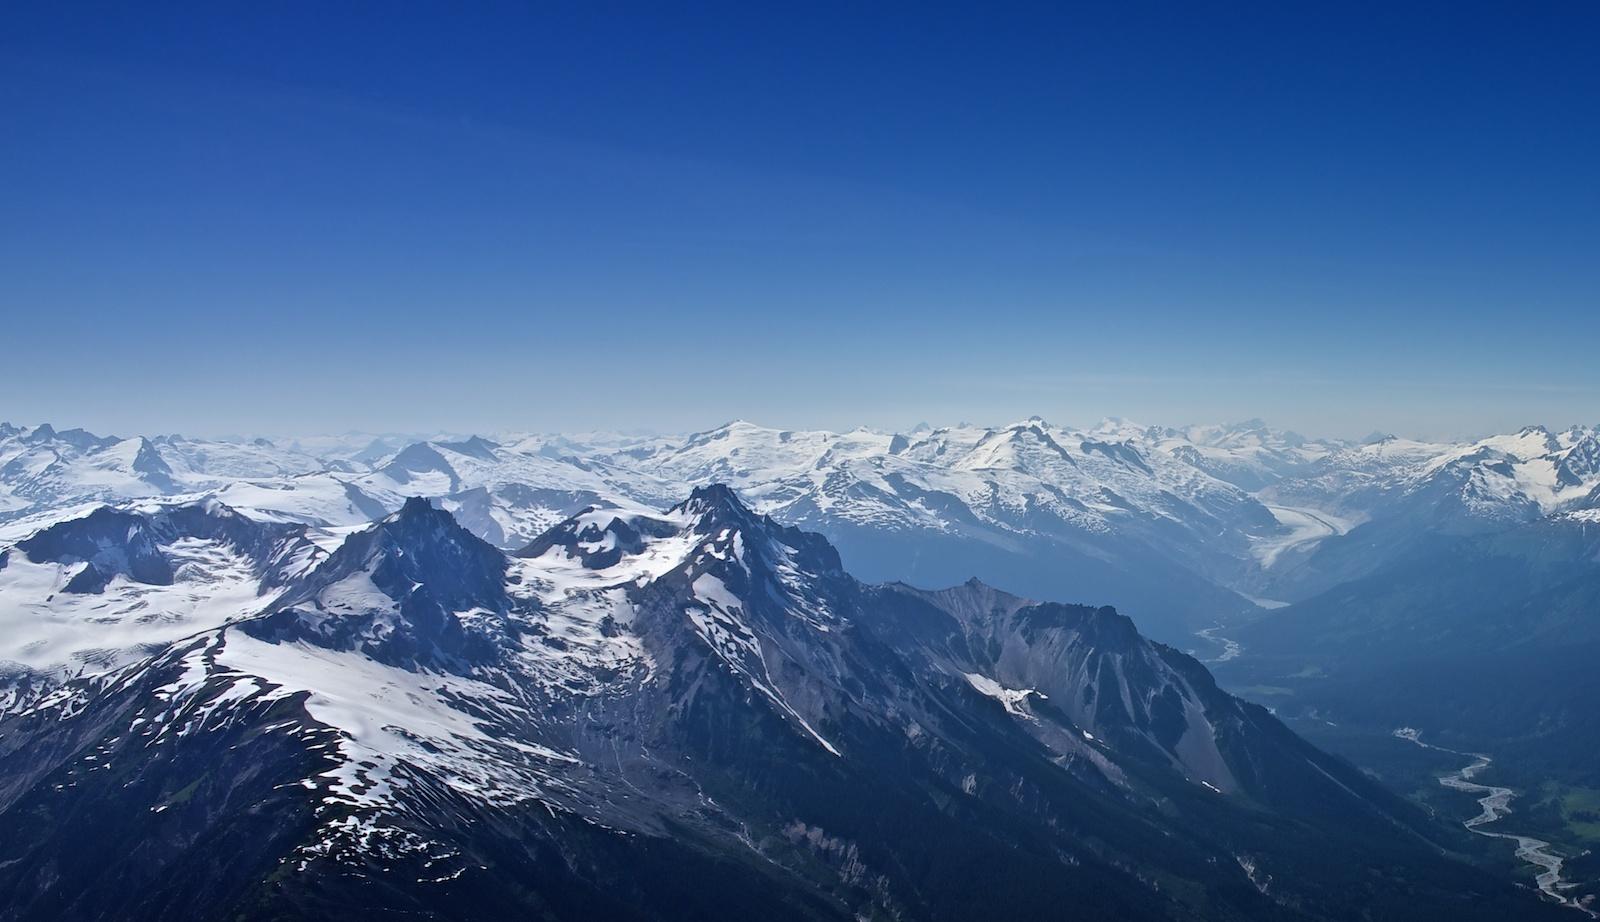 Lillooet Glacier